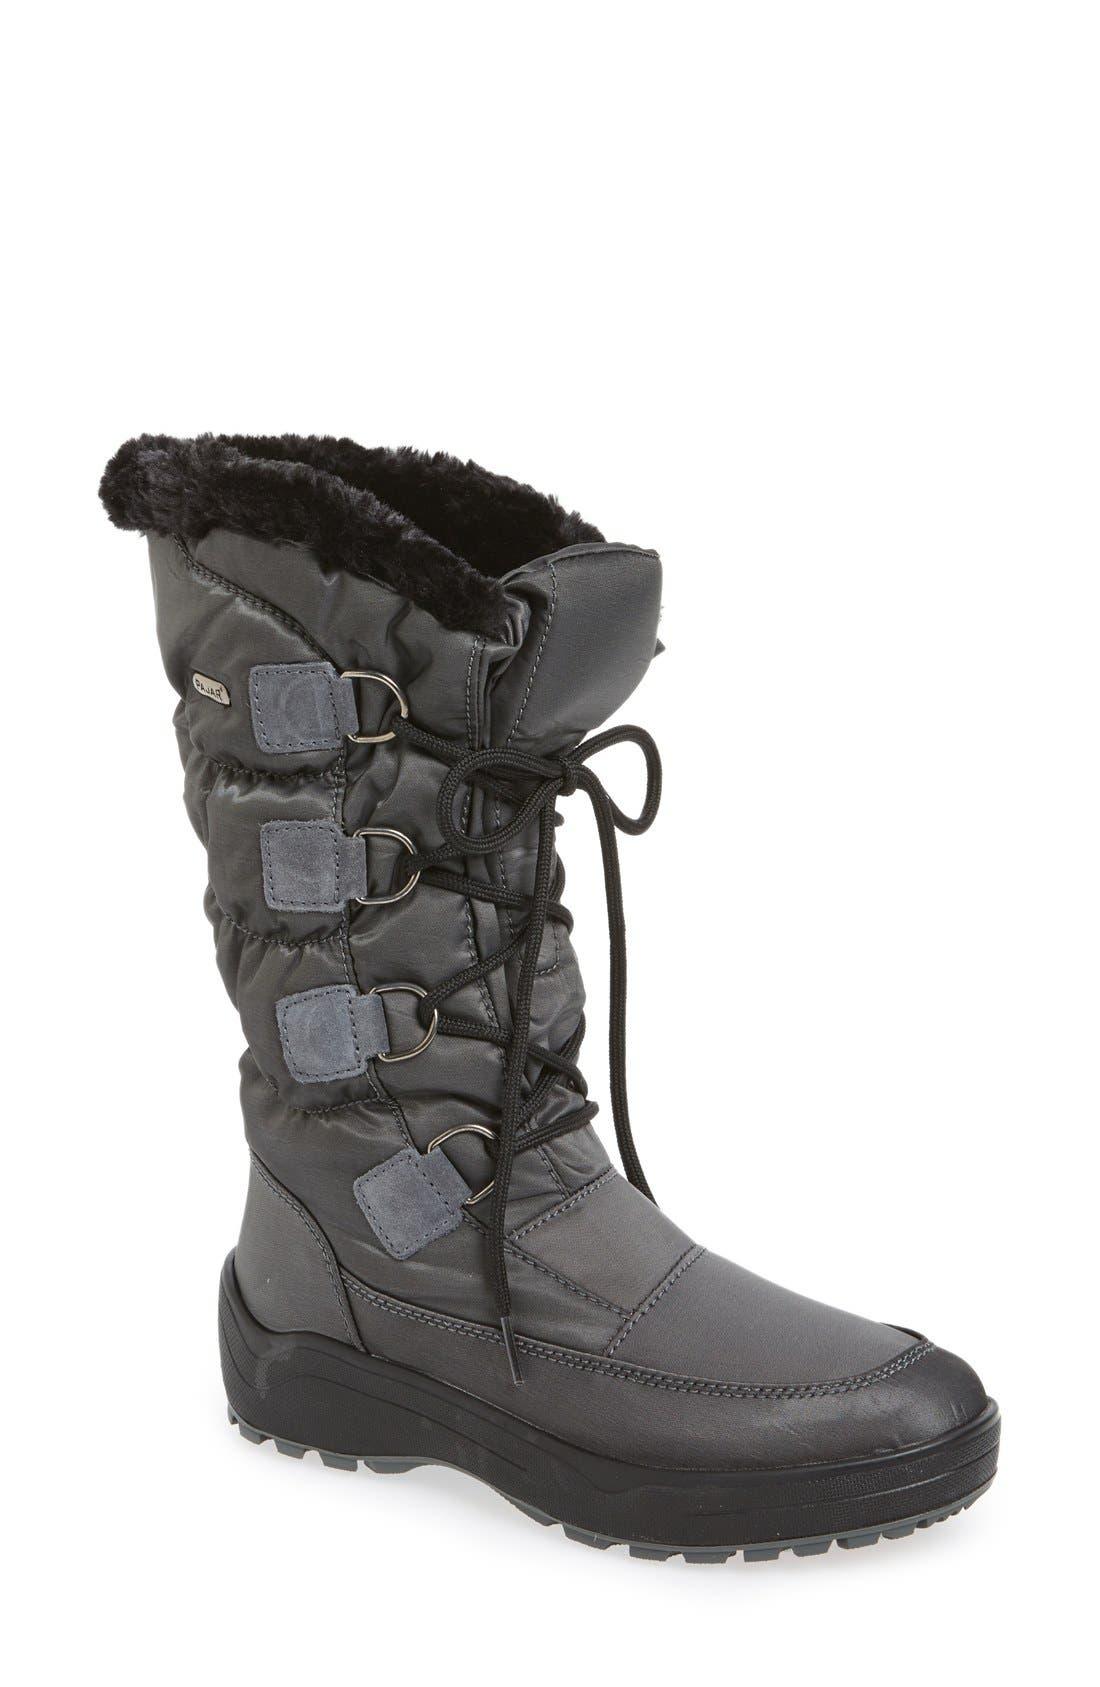 Alternate Image 1 Selected - Pajar 'Riga' Waterproof Ice Grippers® Boot (Women)